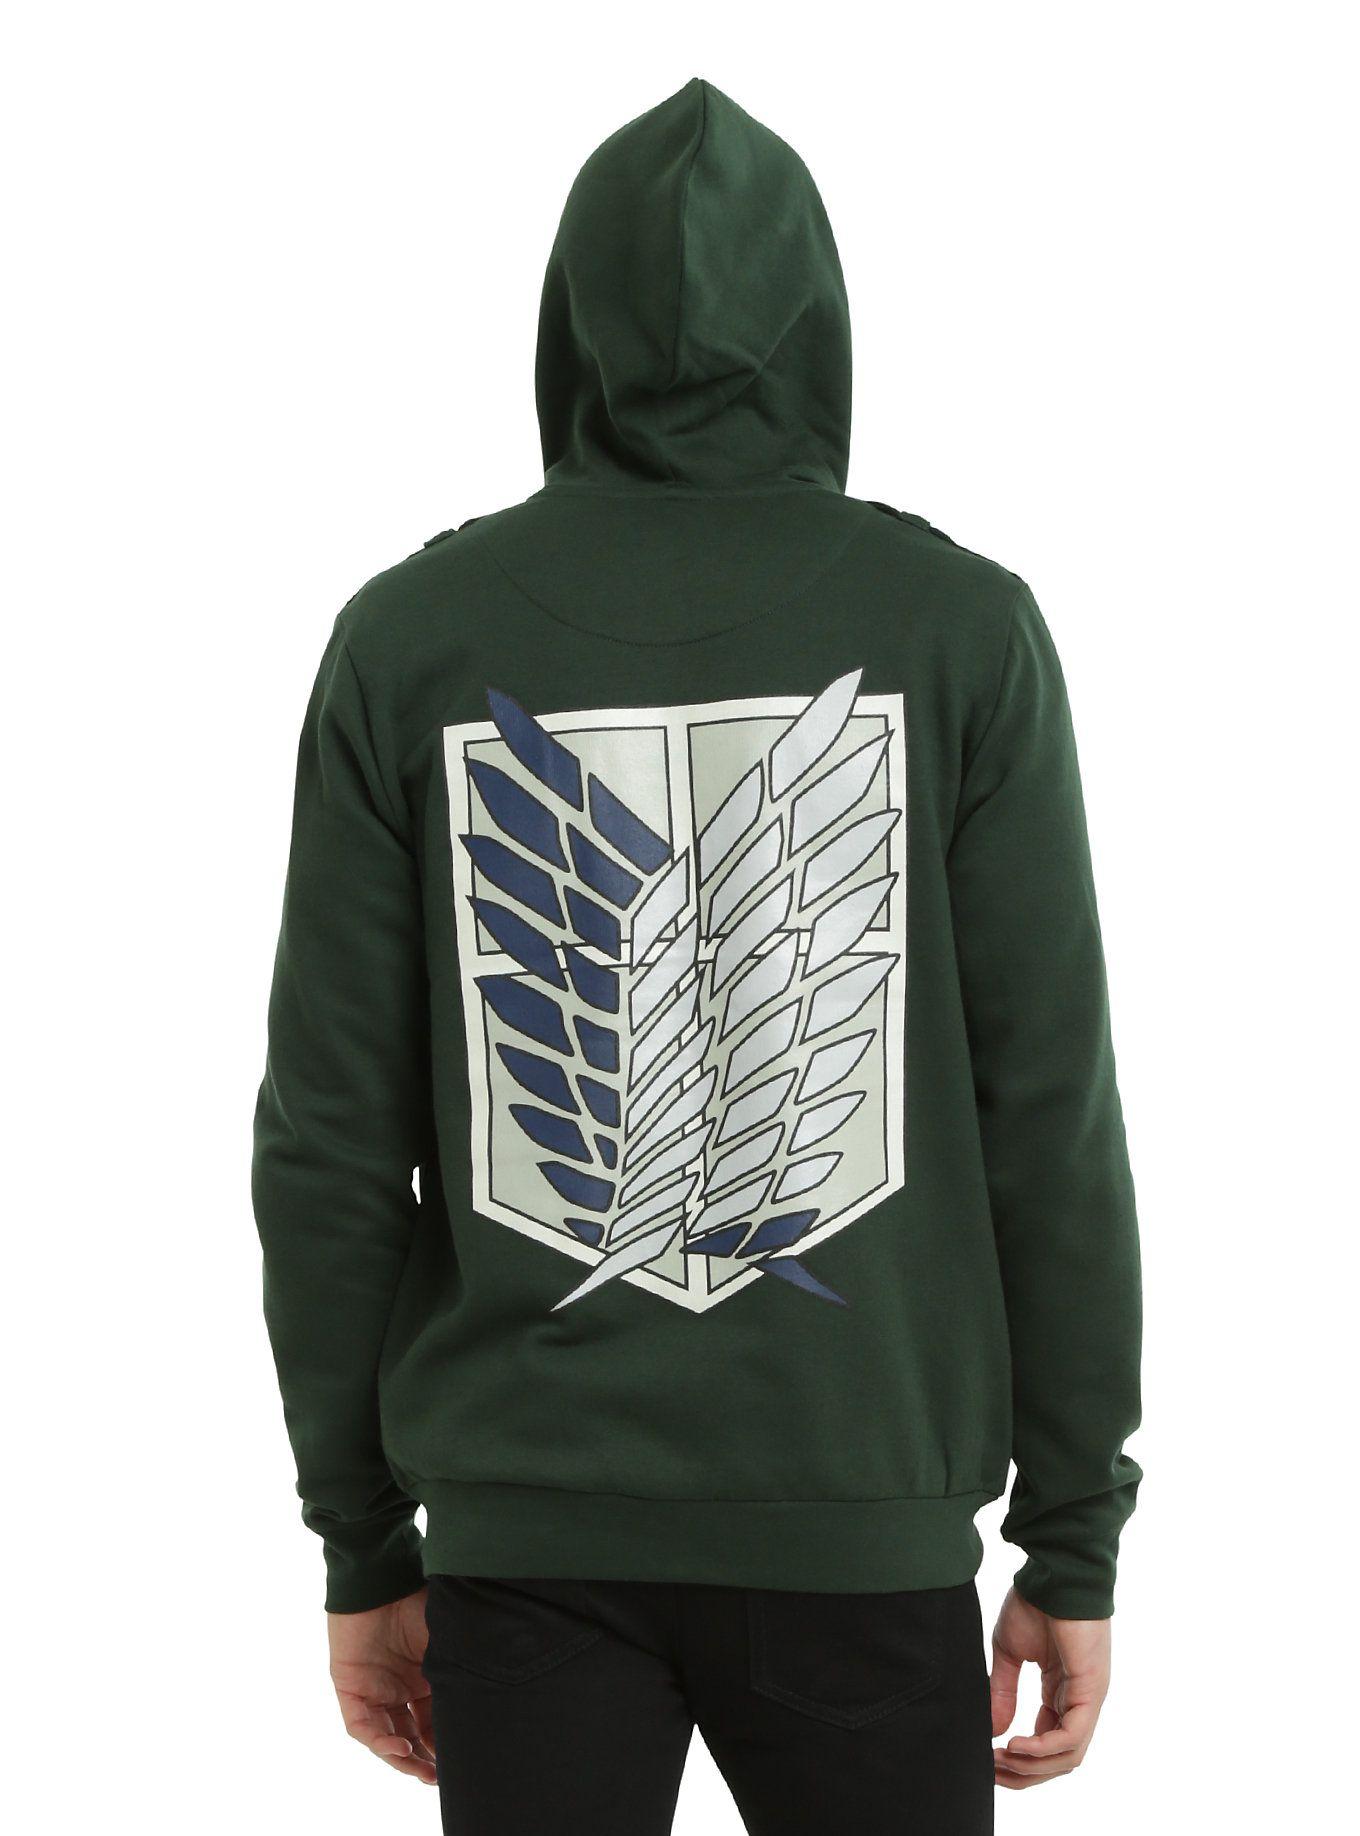 Attack On Titan Scouting Legion Jacket Hoodie | Pinterest